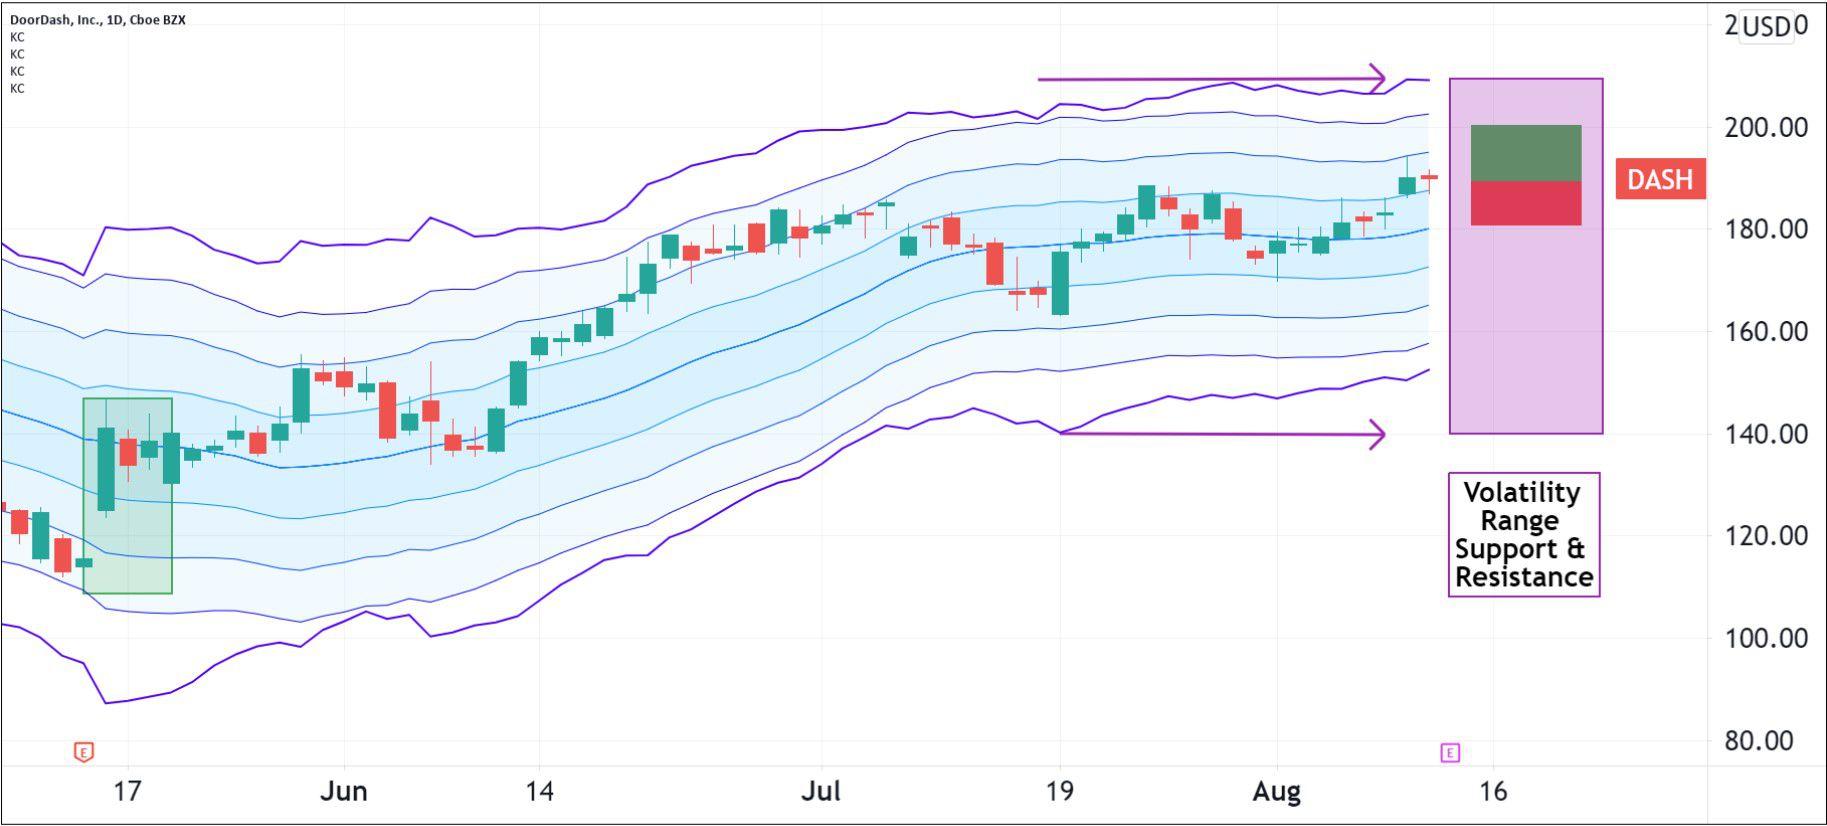 Volatility pattern for DoorDash, Inc. (DASH)